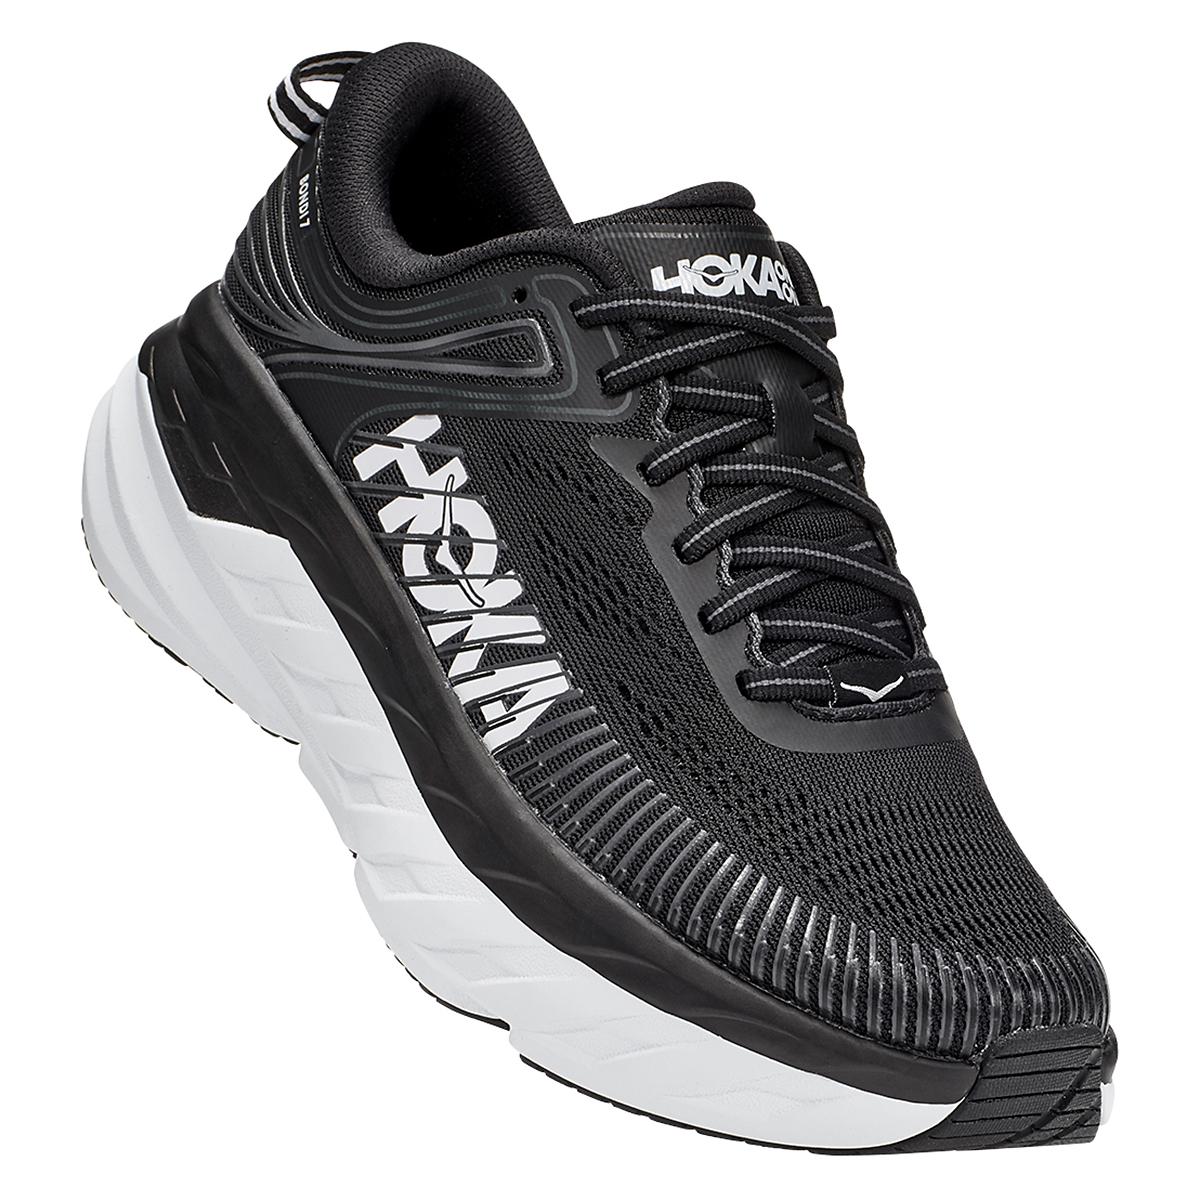 Women's Hoka One One Bondi 7 Running Shoe - Color: Black/White - Size: 5 - Width: Regular, Black/White, large, image 2